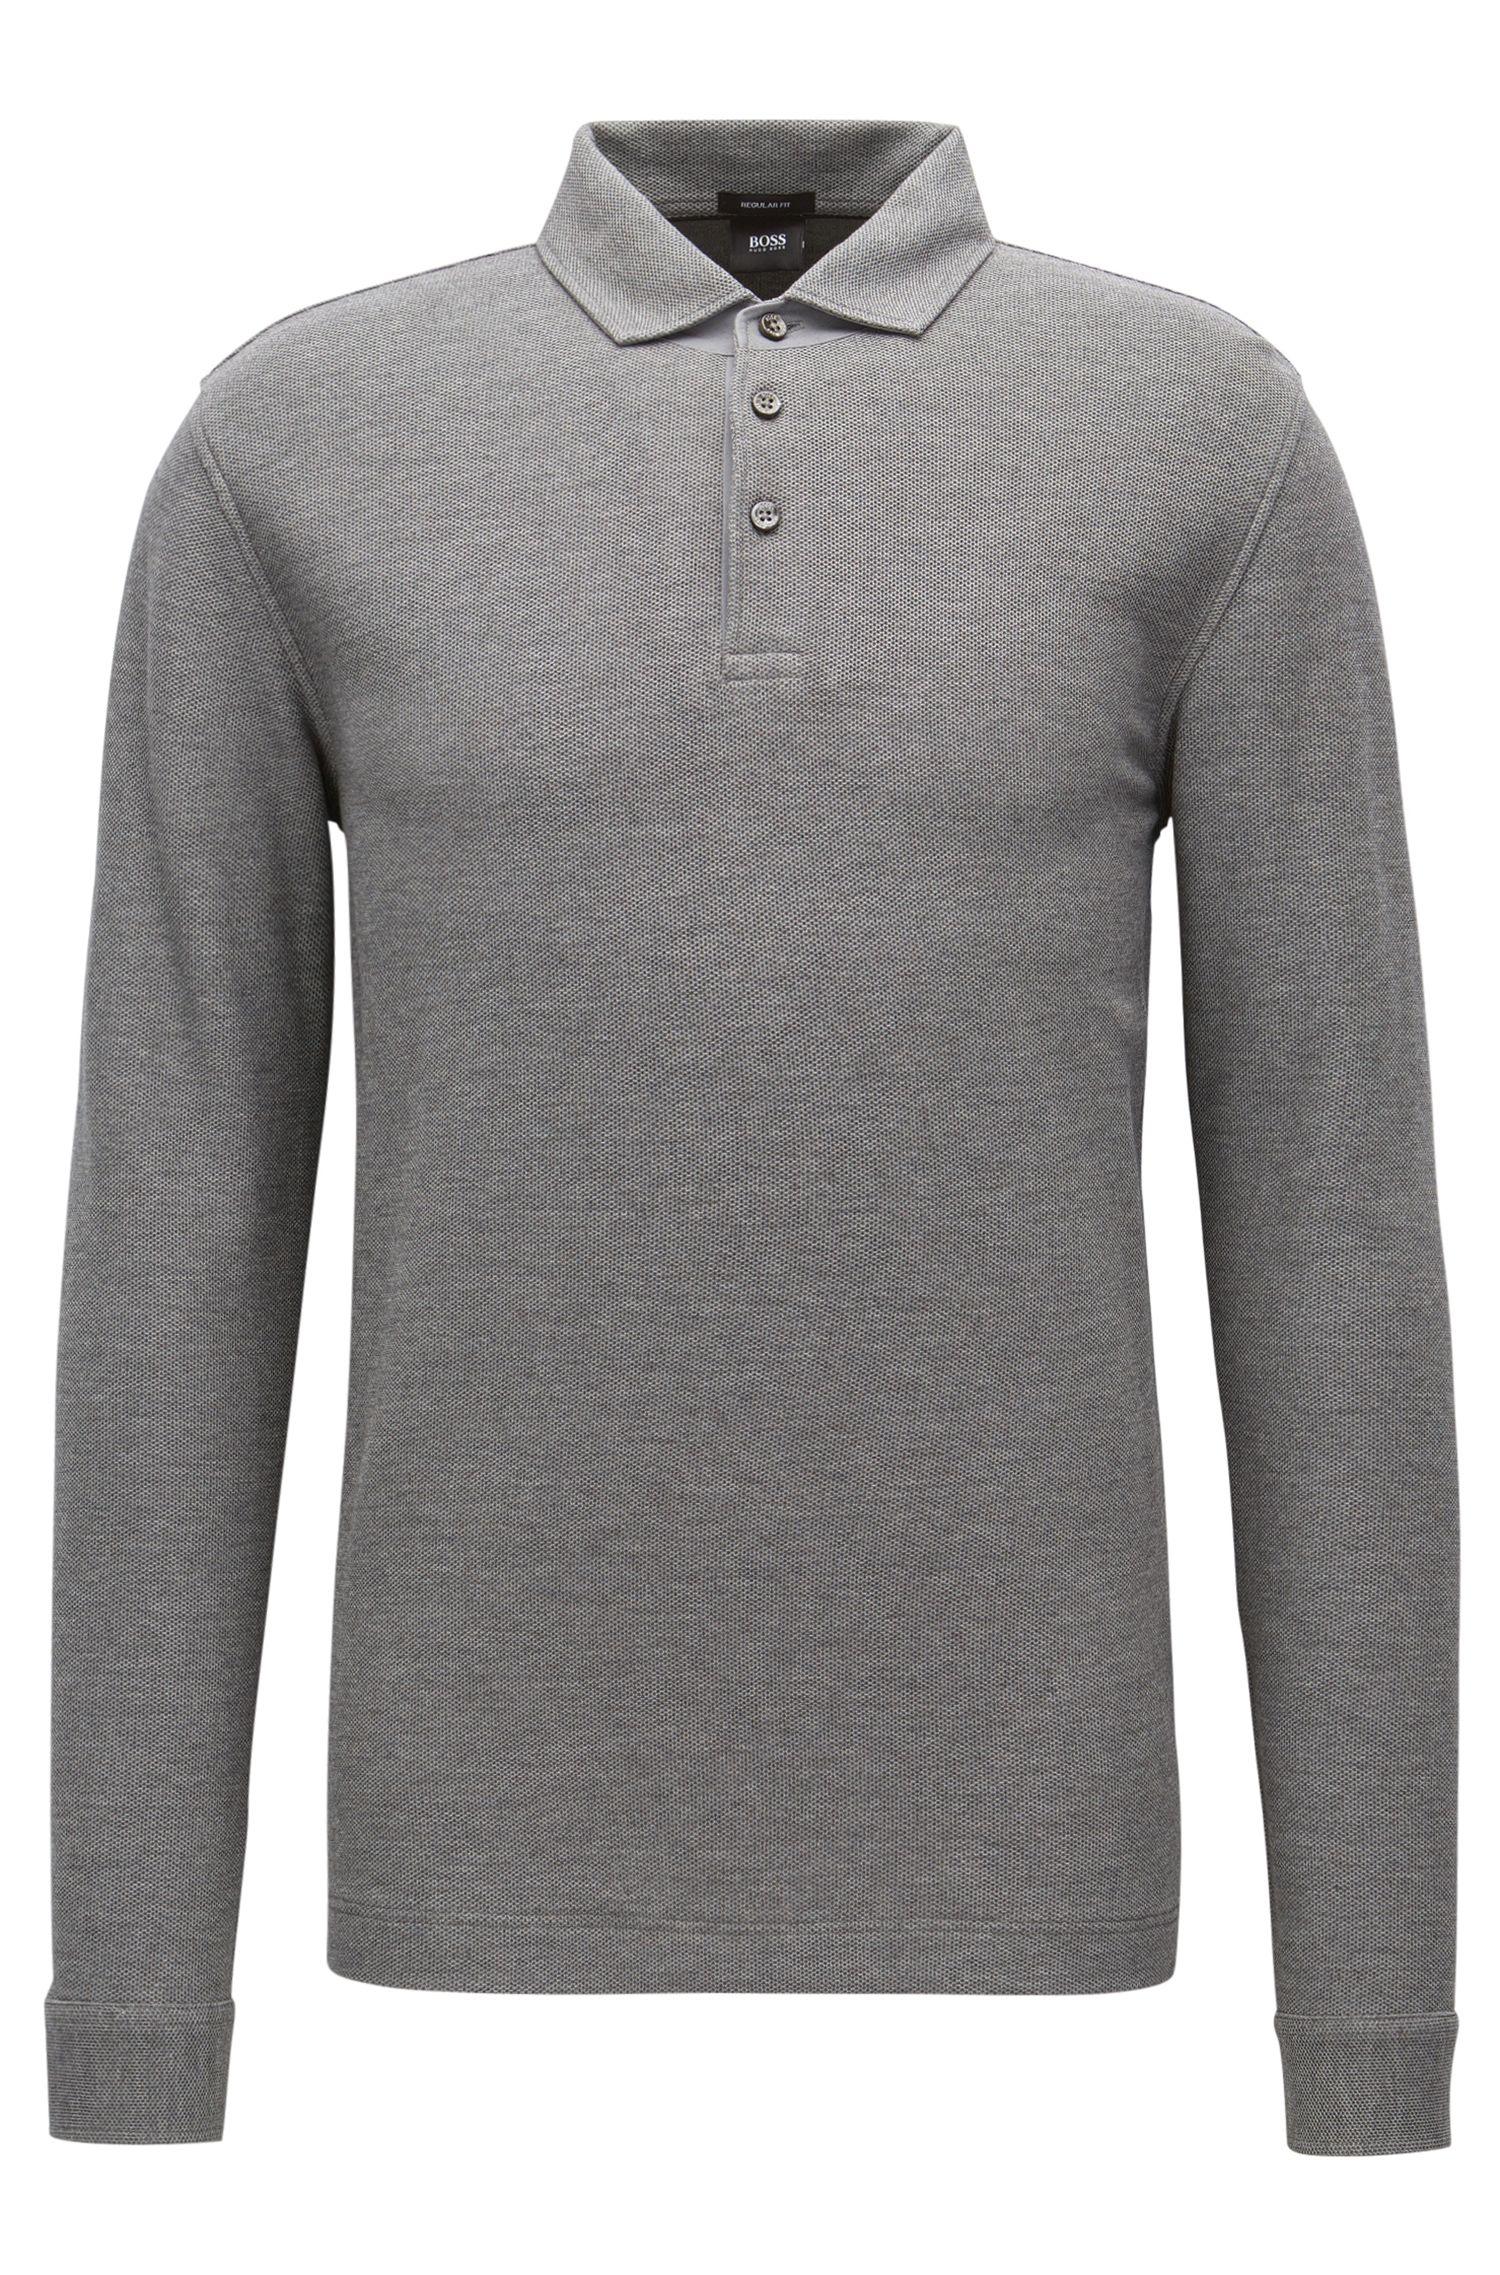 Piqué Cotton Polo Shirt, Regular Fit | Pickell, Grey